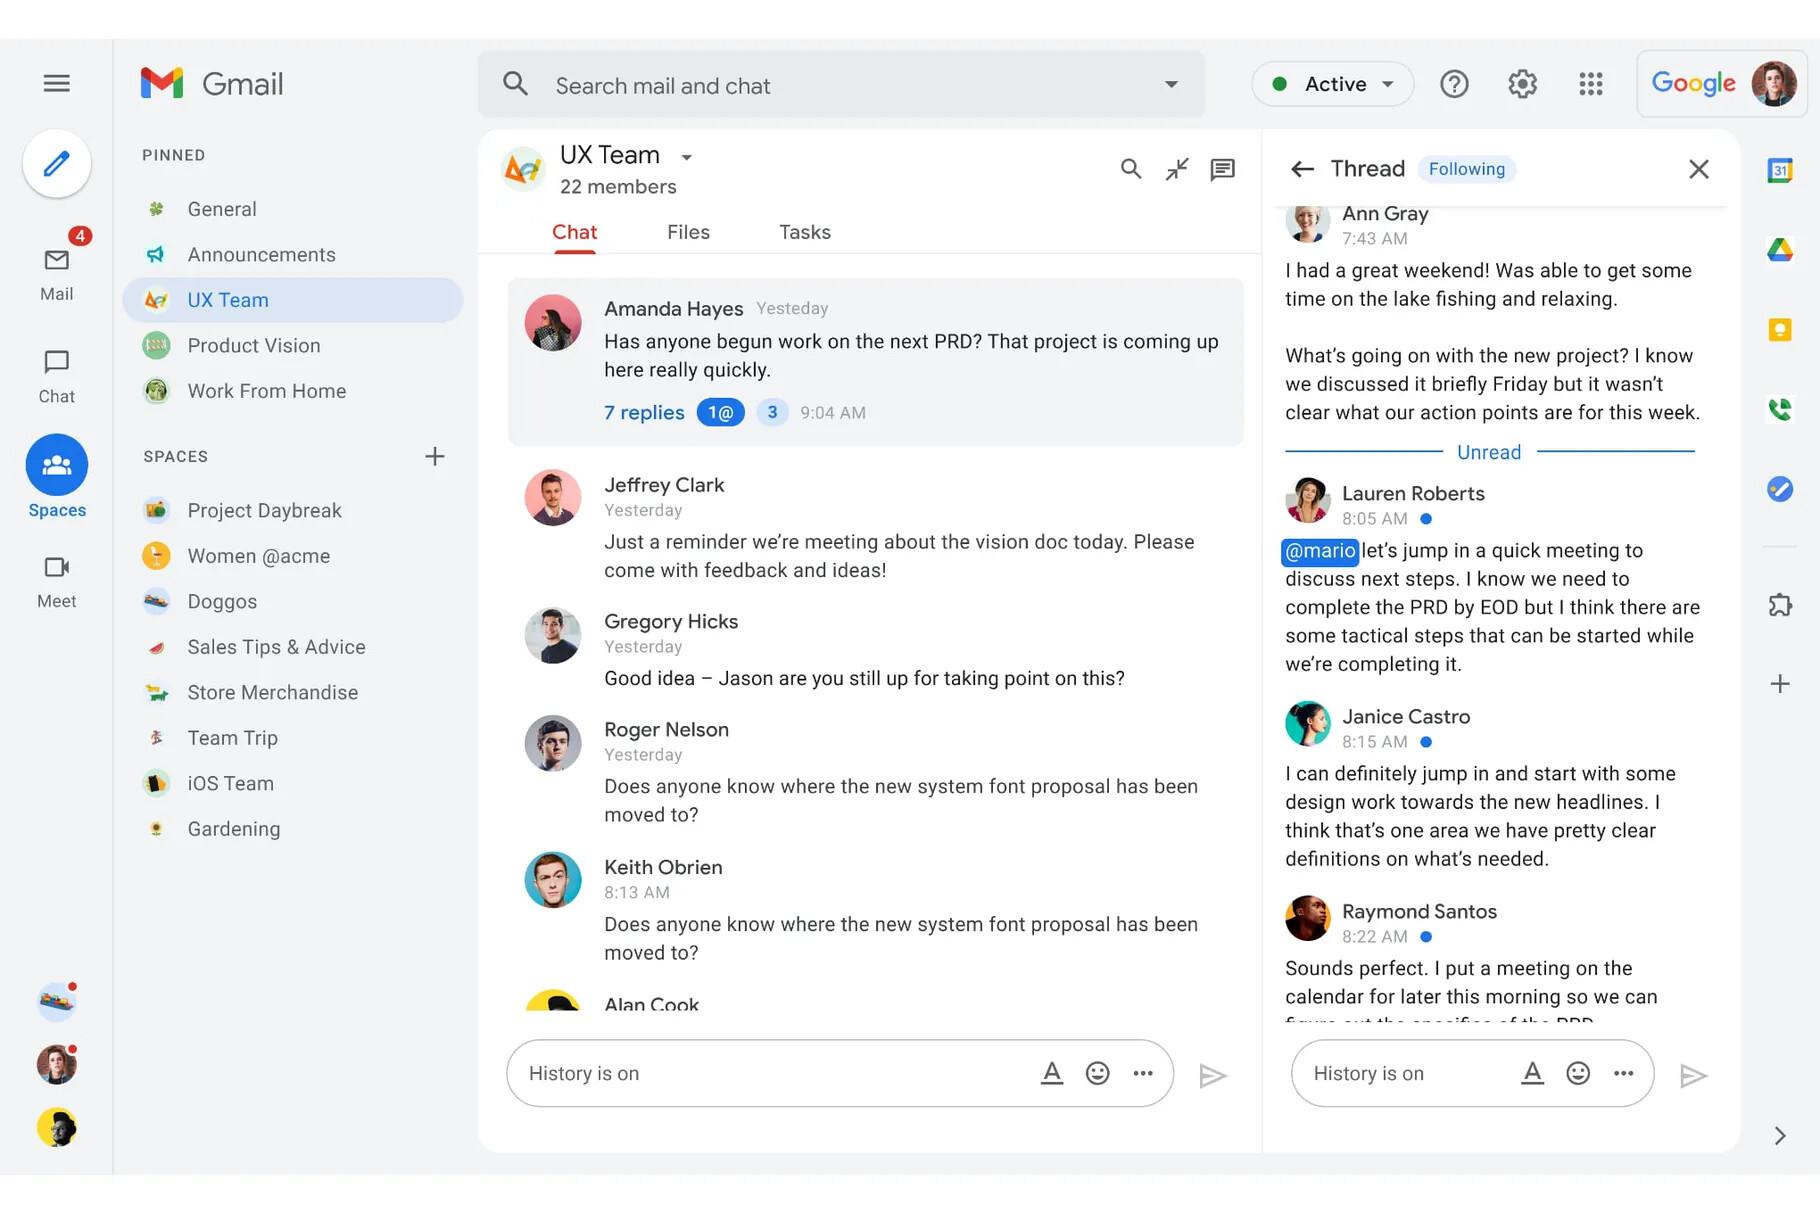 Google обновила Gmail и добавила звонки, чаты и каналы